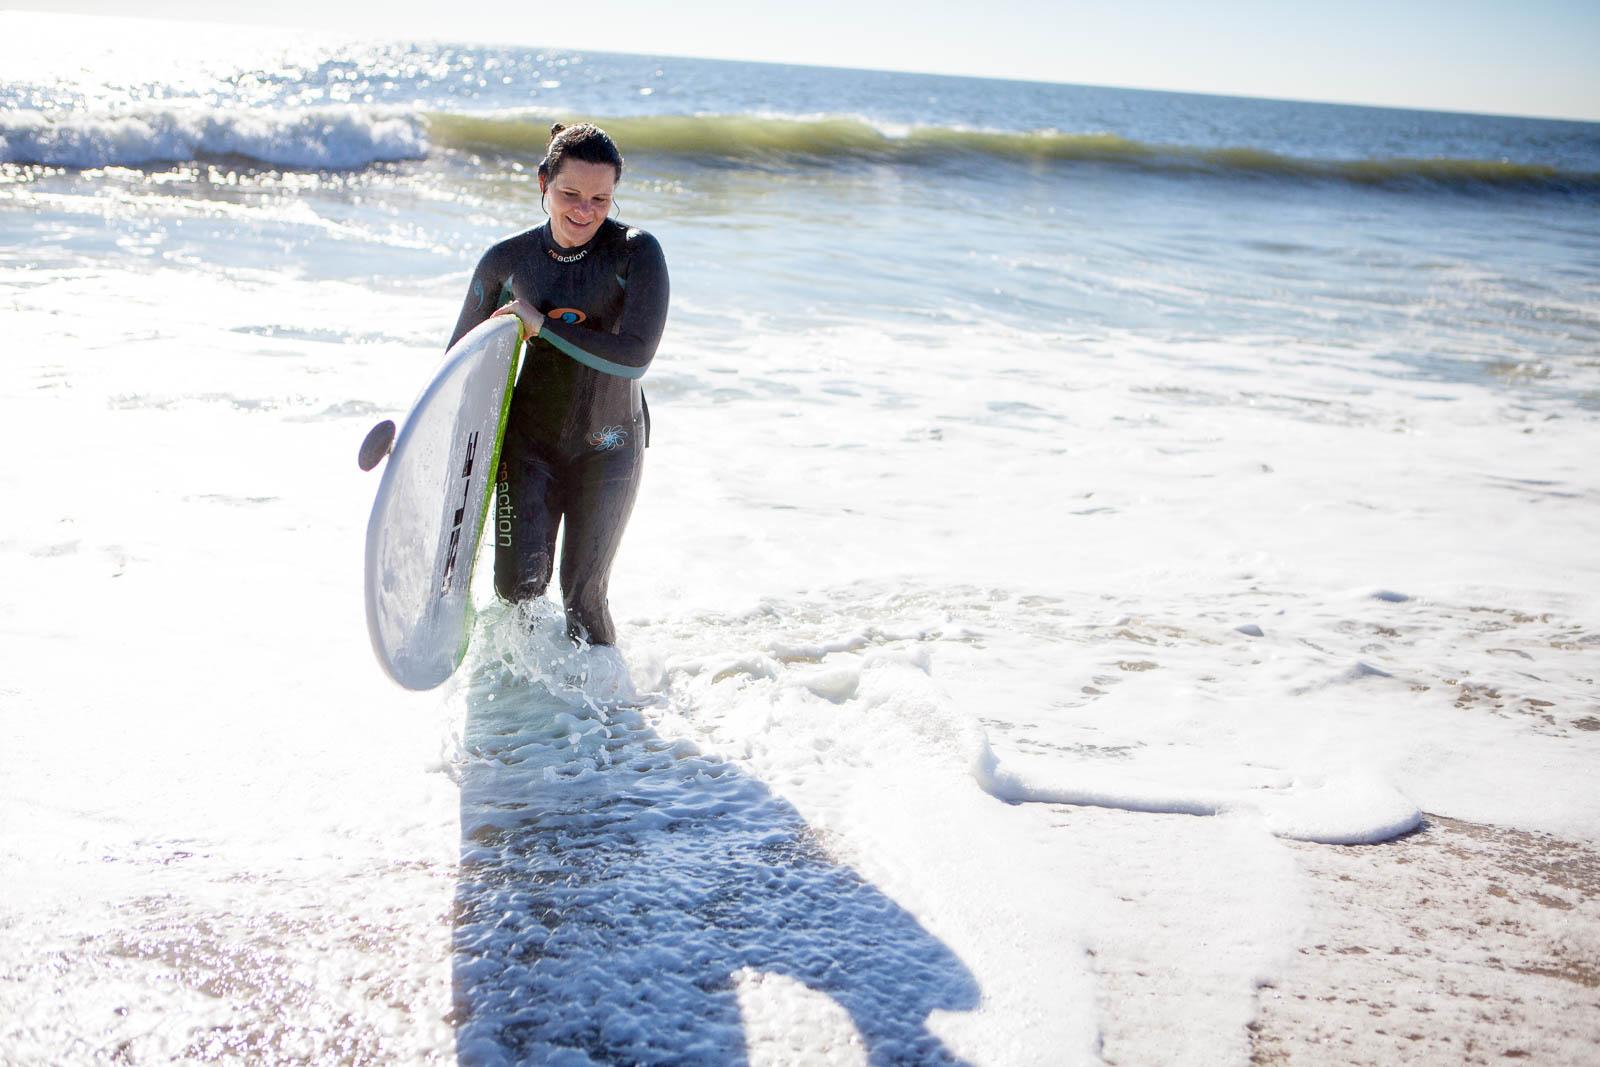 surfing-in-november-1-2